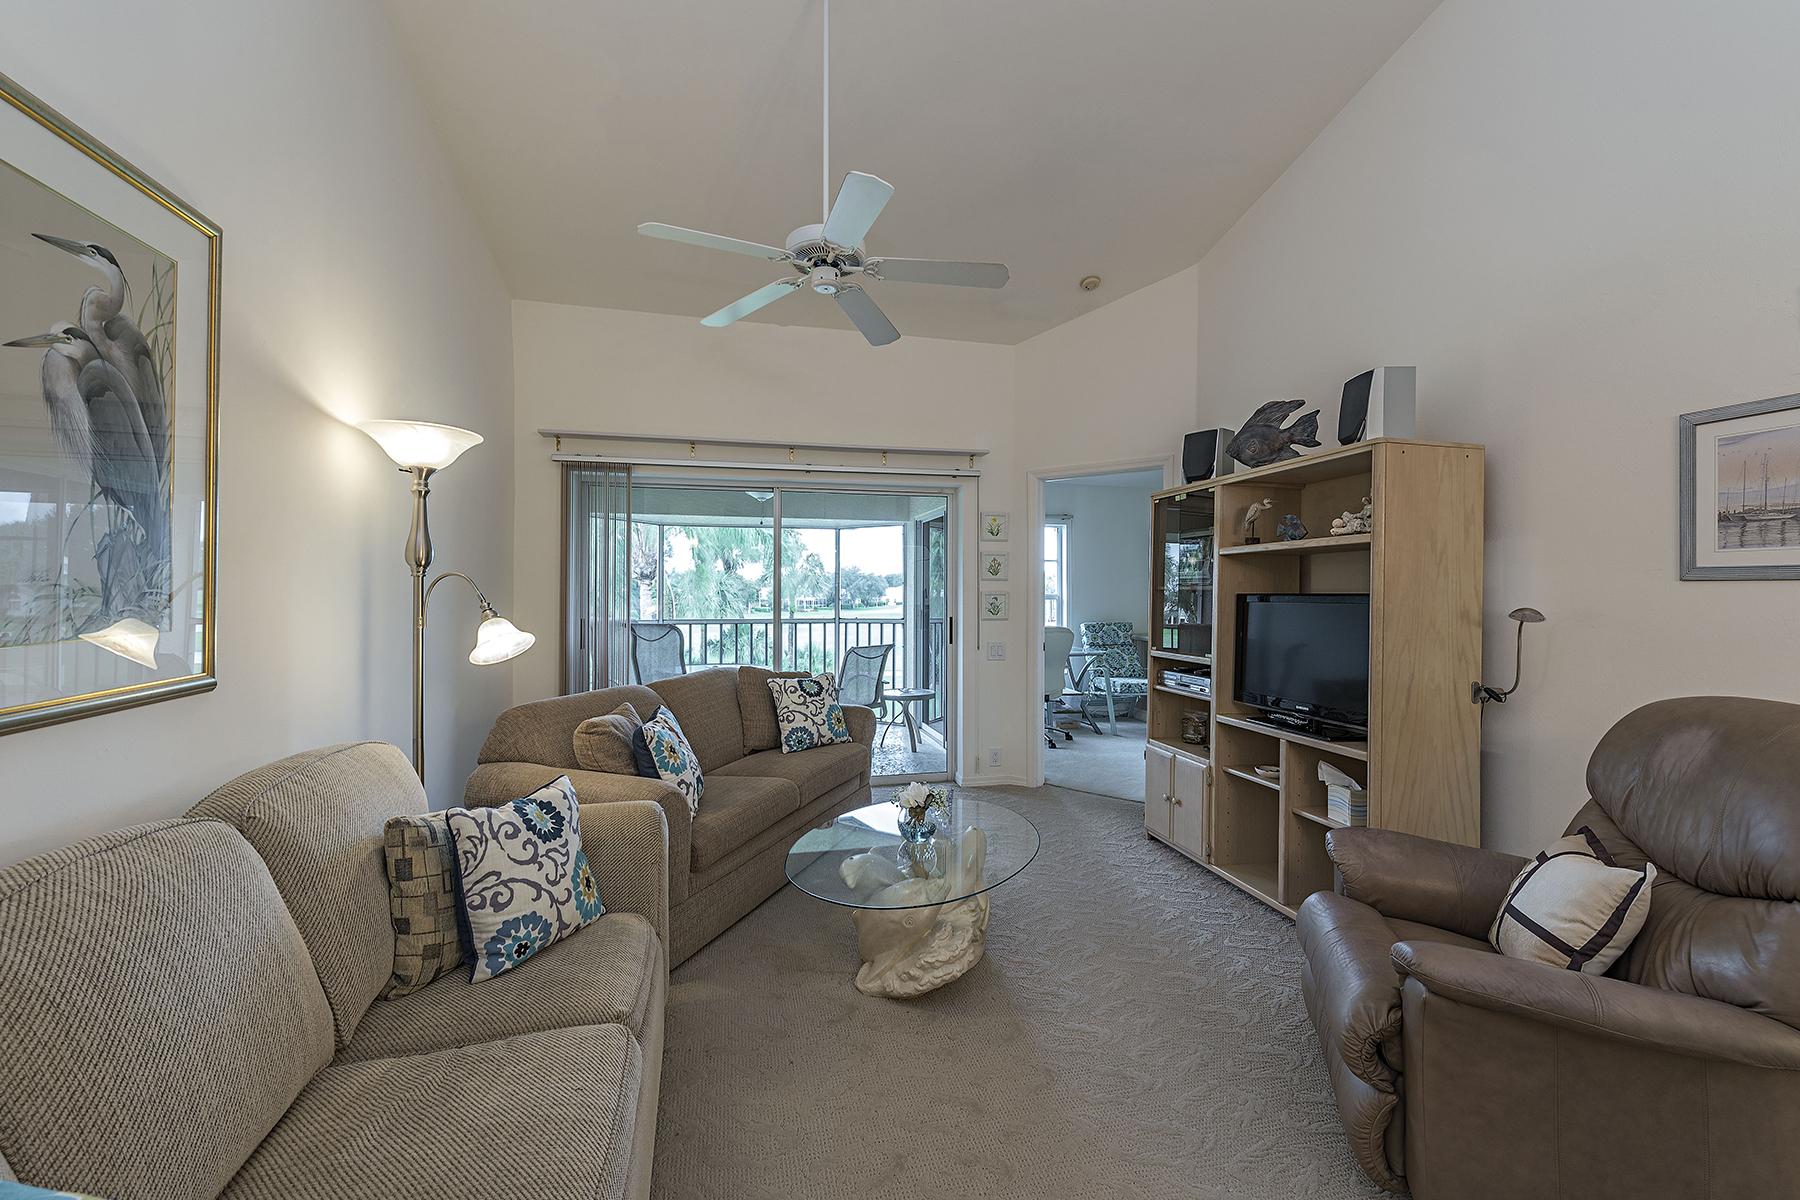 Condomínio para Venda às WORTHINGTON 13621 Worthington Way 1410 Bonita Springs, Florida, 34135 Estados Unidos